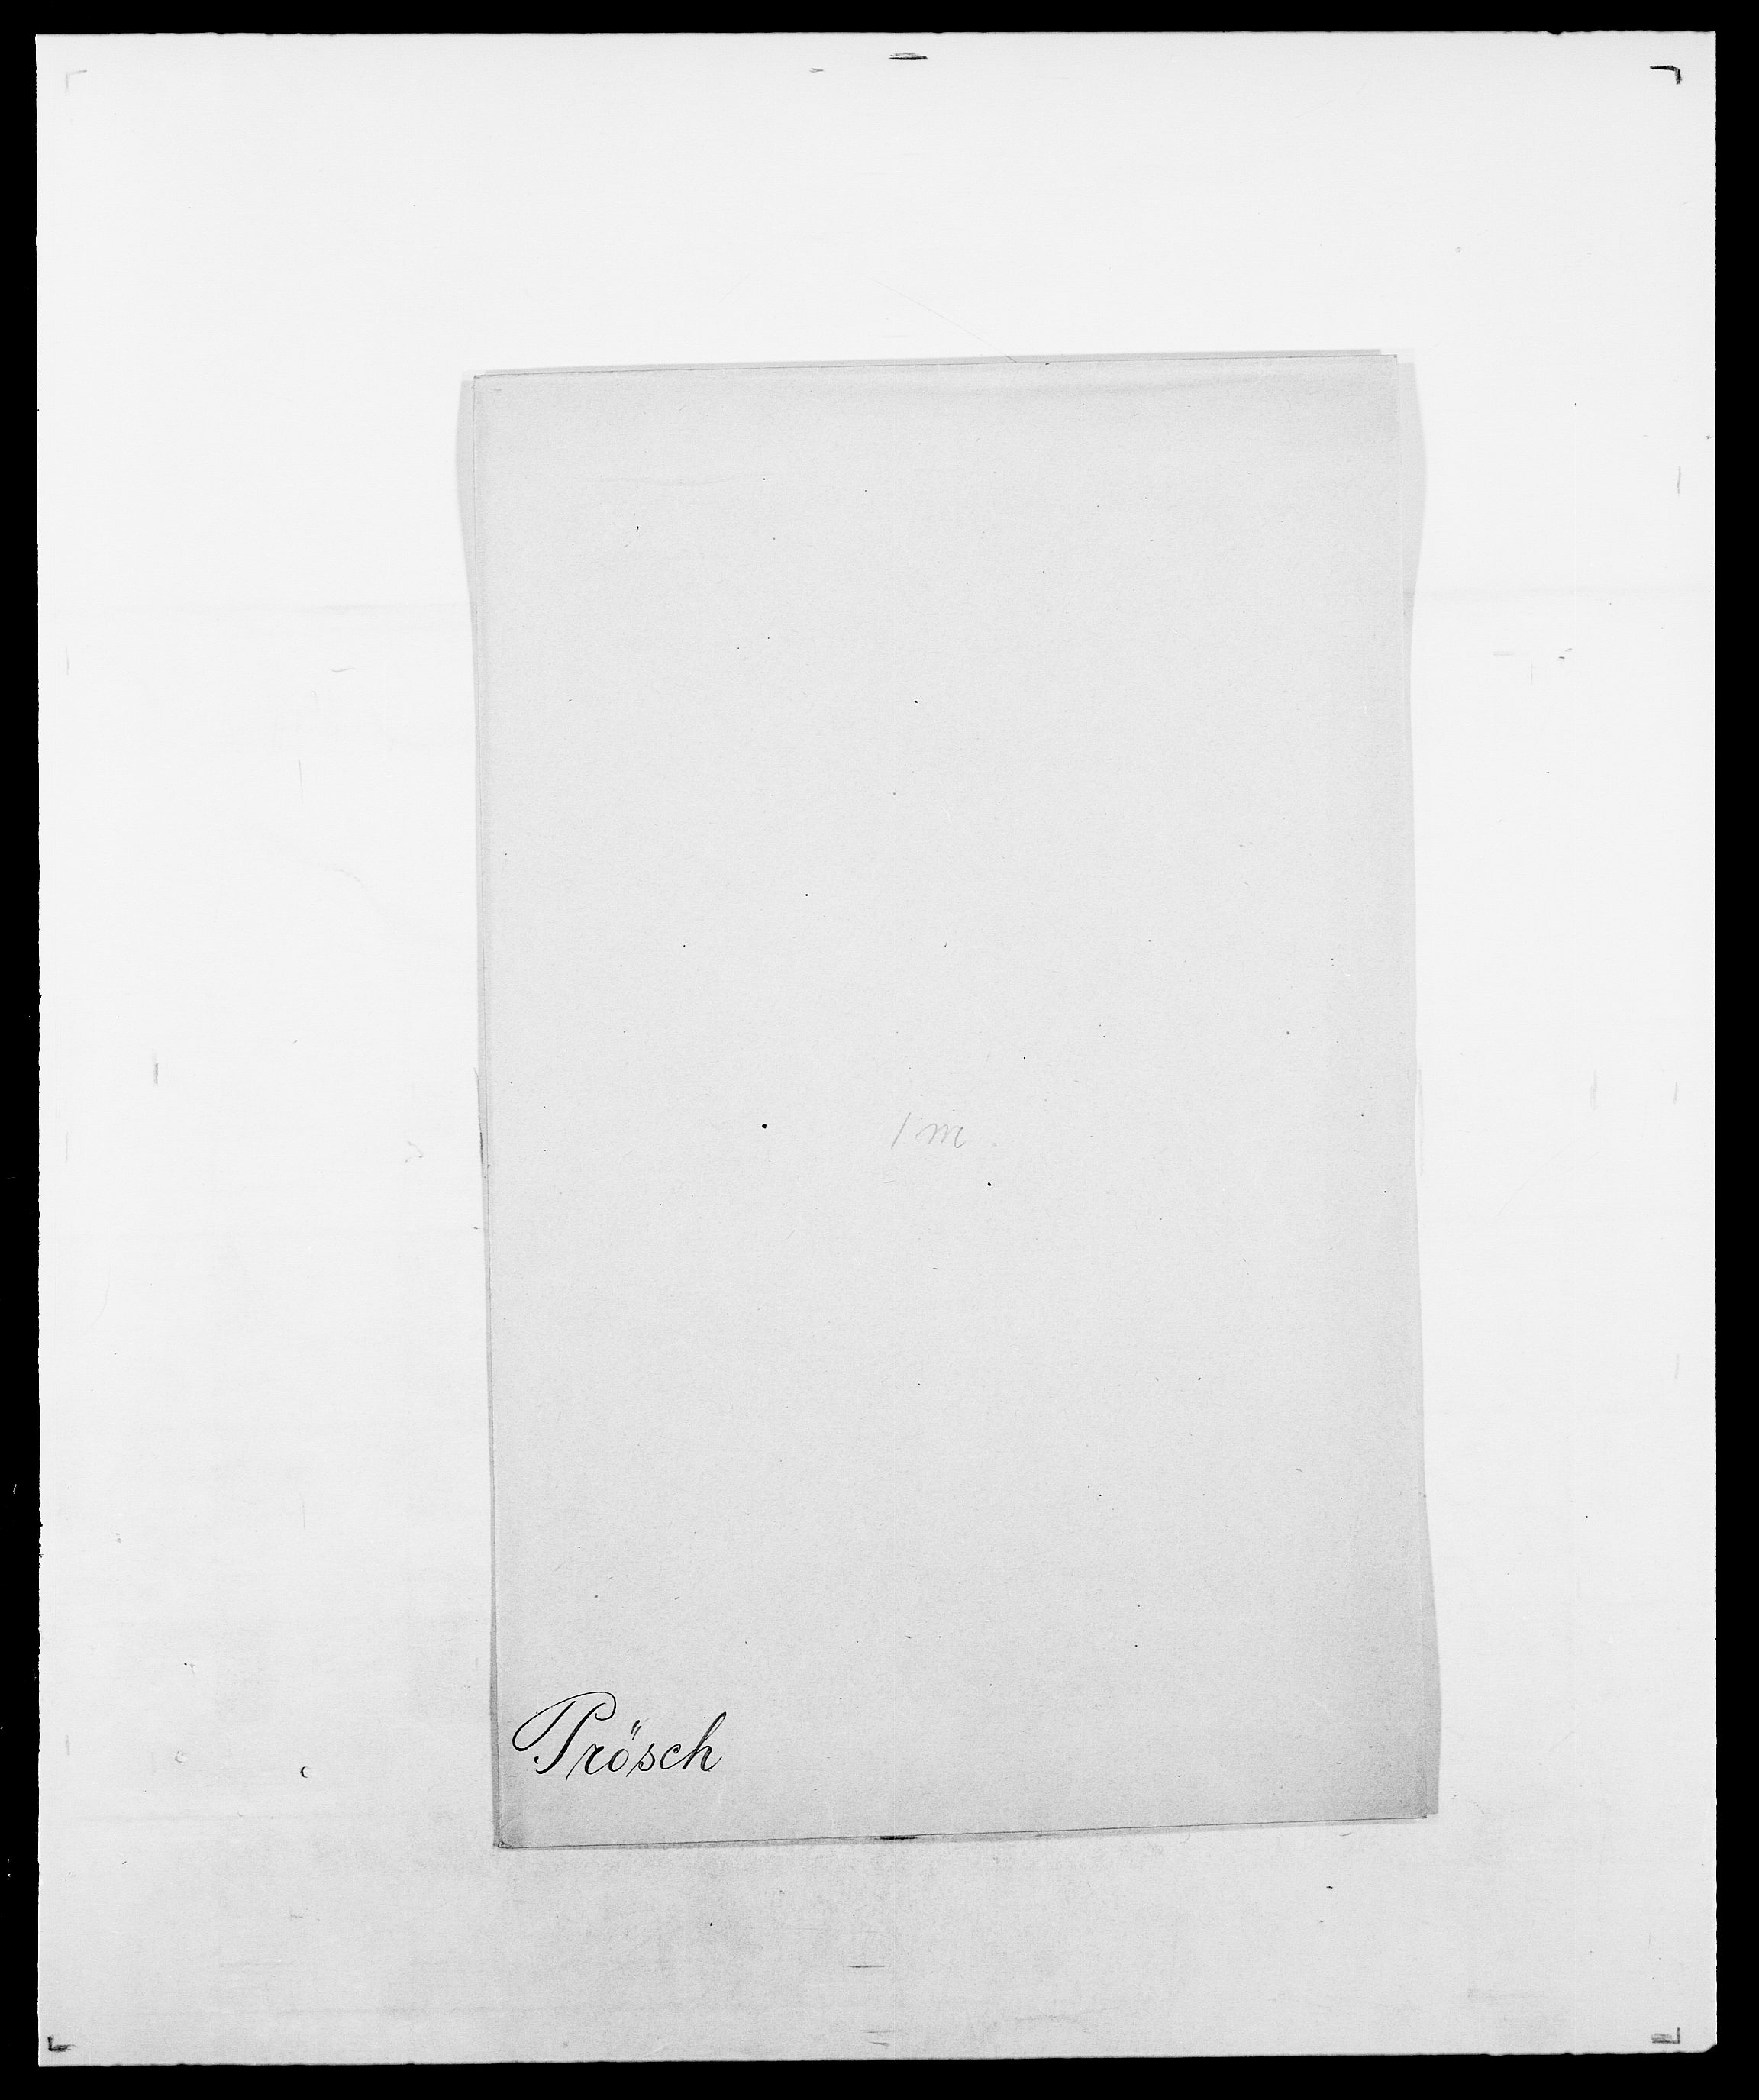 SAO, Delgobe, Charles Antoine - samling, D/Da/L0031: de Place - Raaum, s. 422